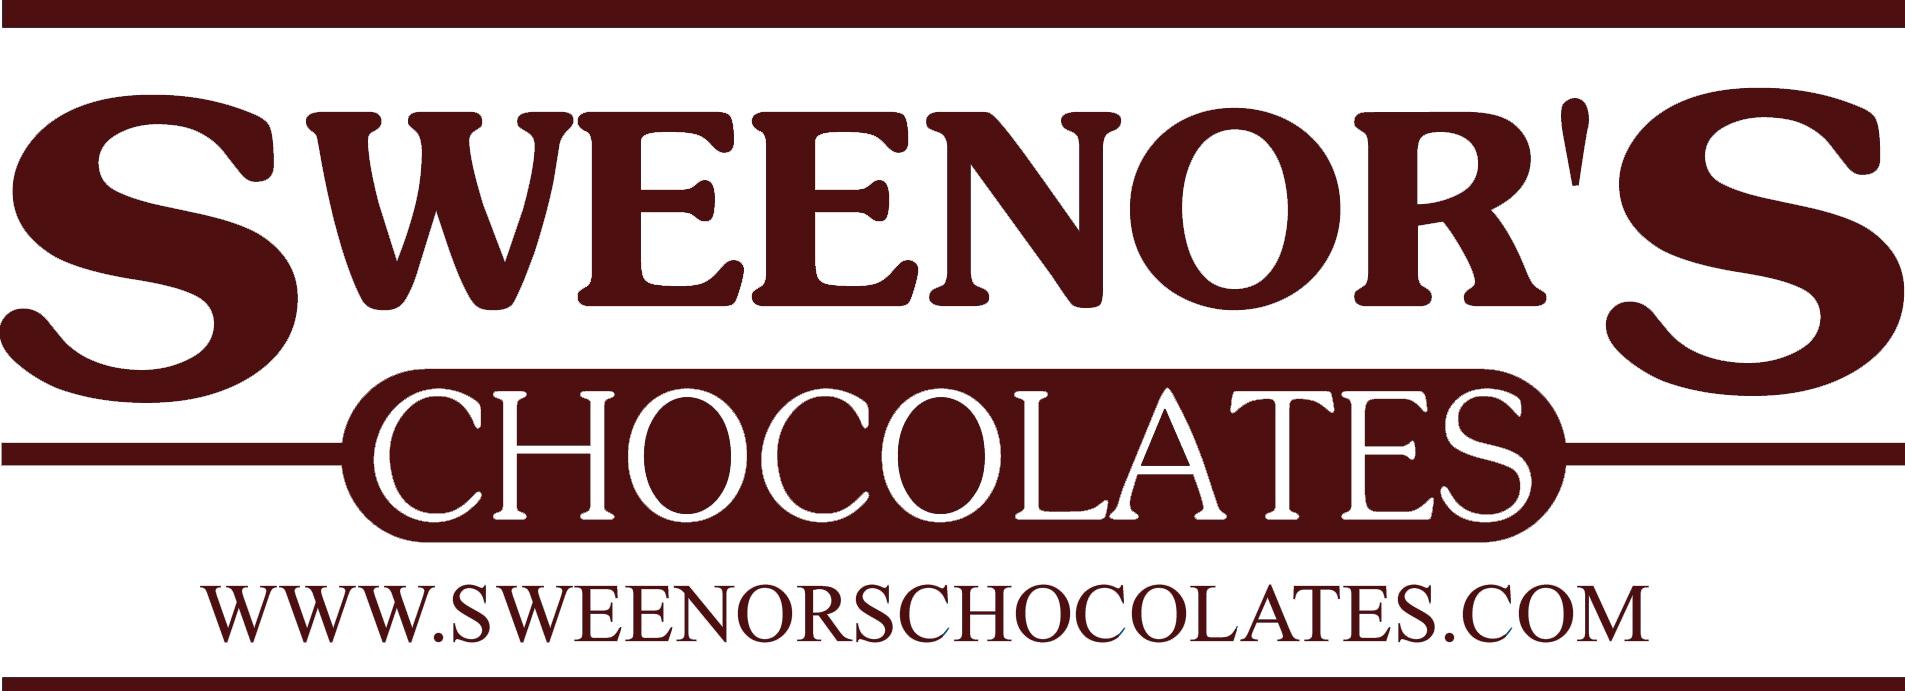 Sweenor Chocolates